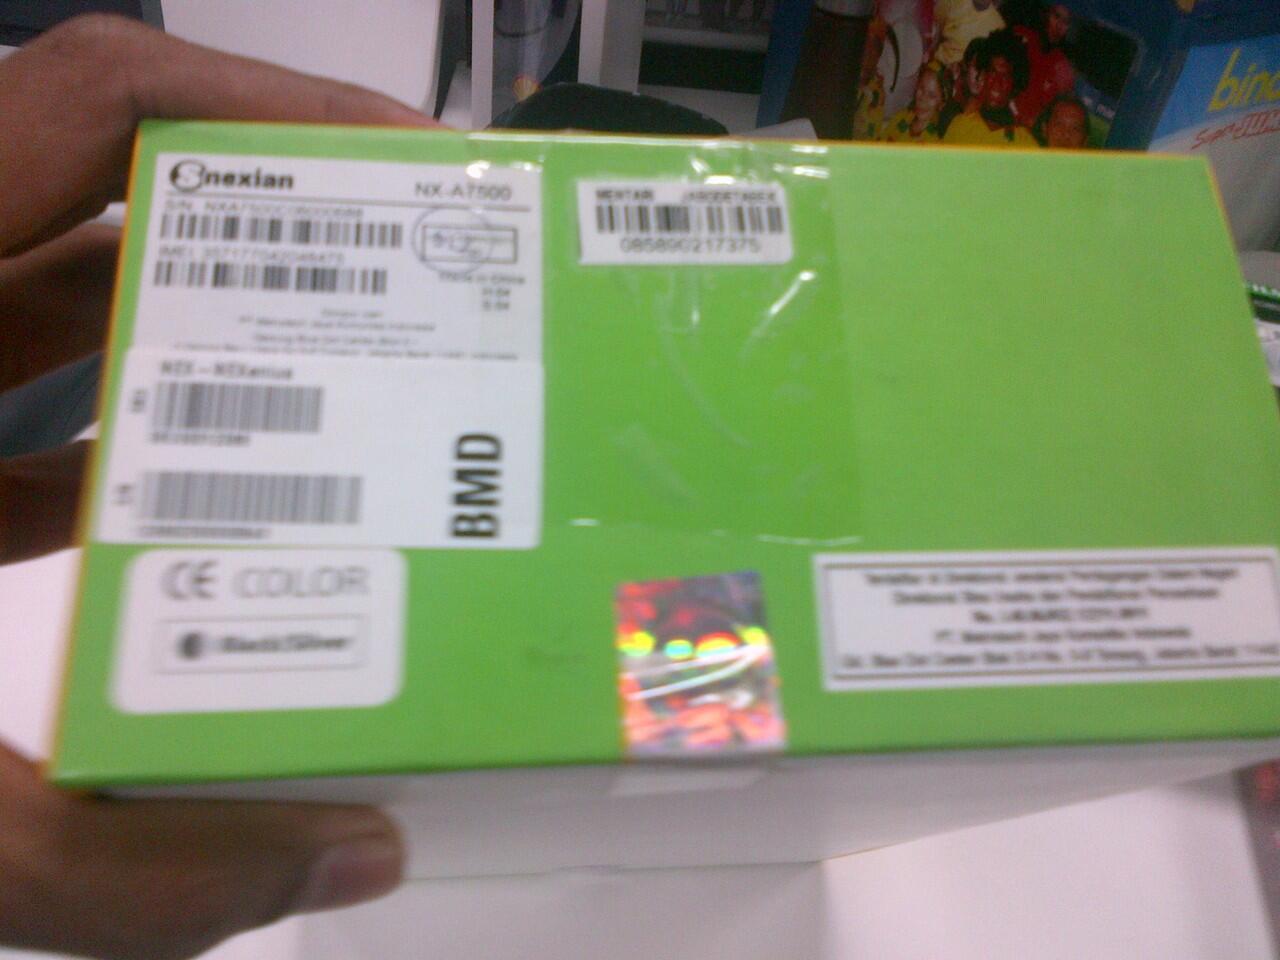 Jual Tablet Nexian Genius NX-A7500 Baru, Segel, Garansi Resmi (1.7 juta)